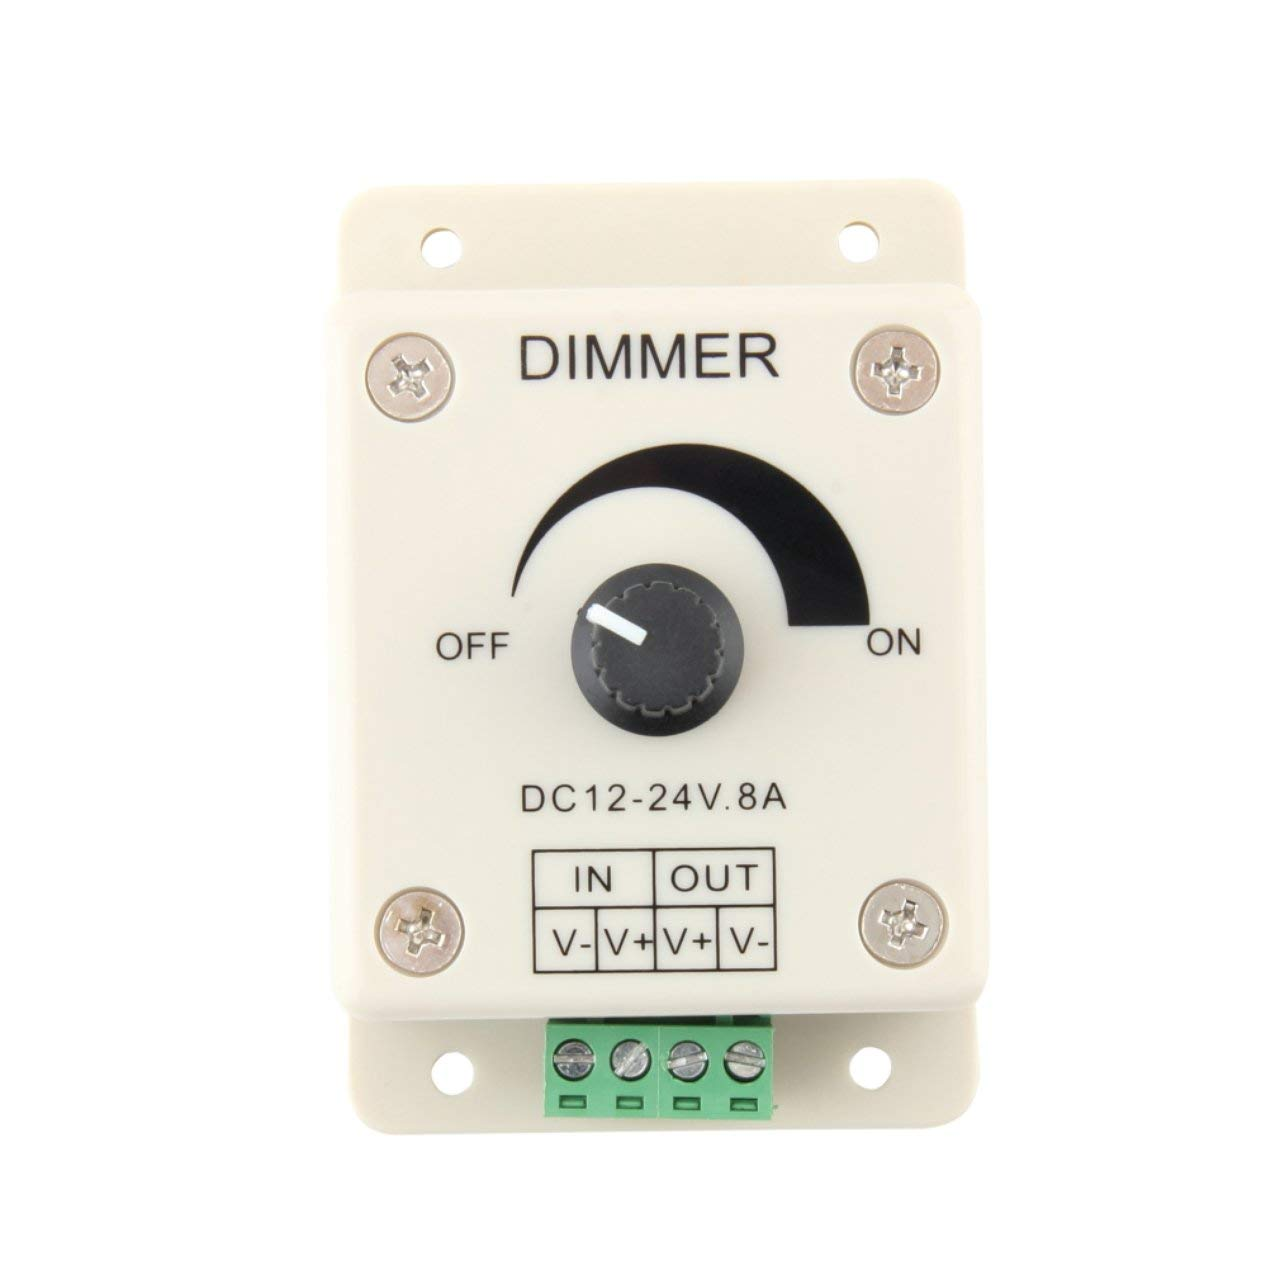 12V 8A LED Light Protect Strip Dimmer Adjustable Brightness Controller For LED Strip Light Lamp Accessories